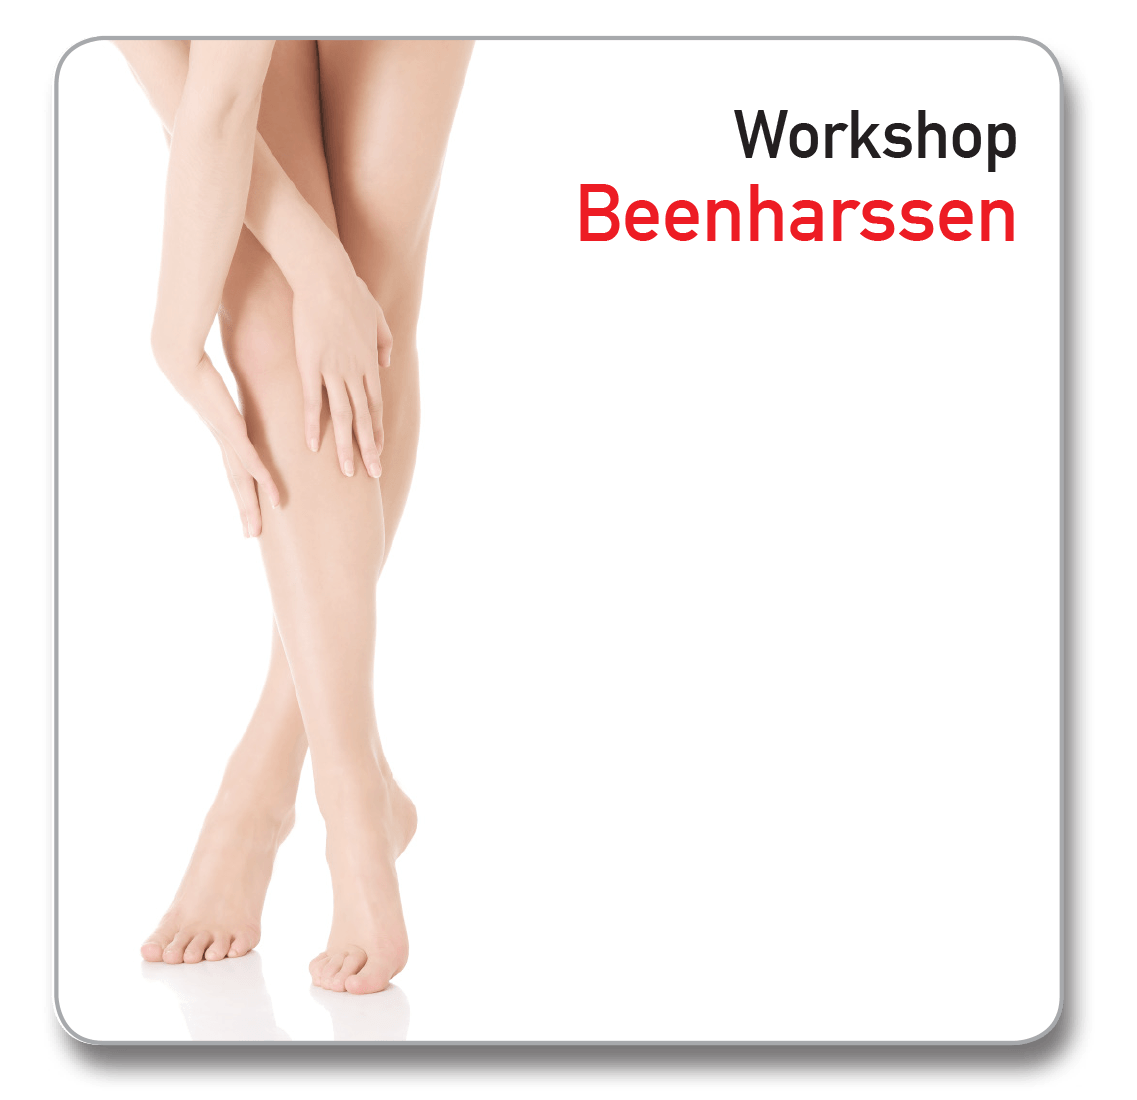 Workshop Ontharen beenharssen